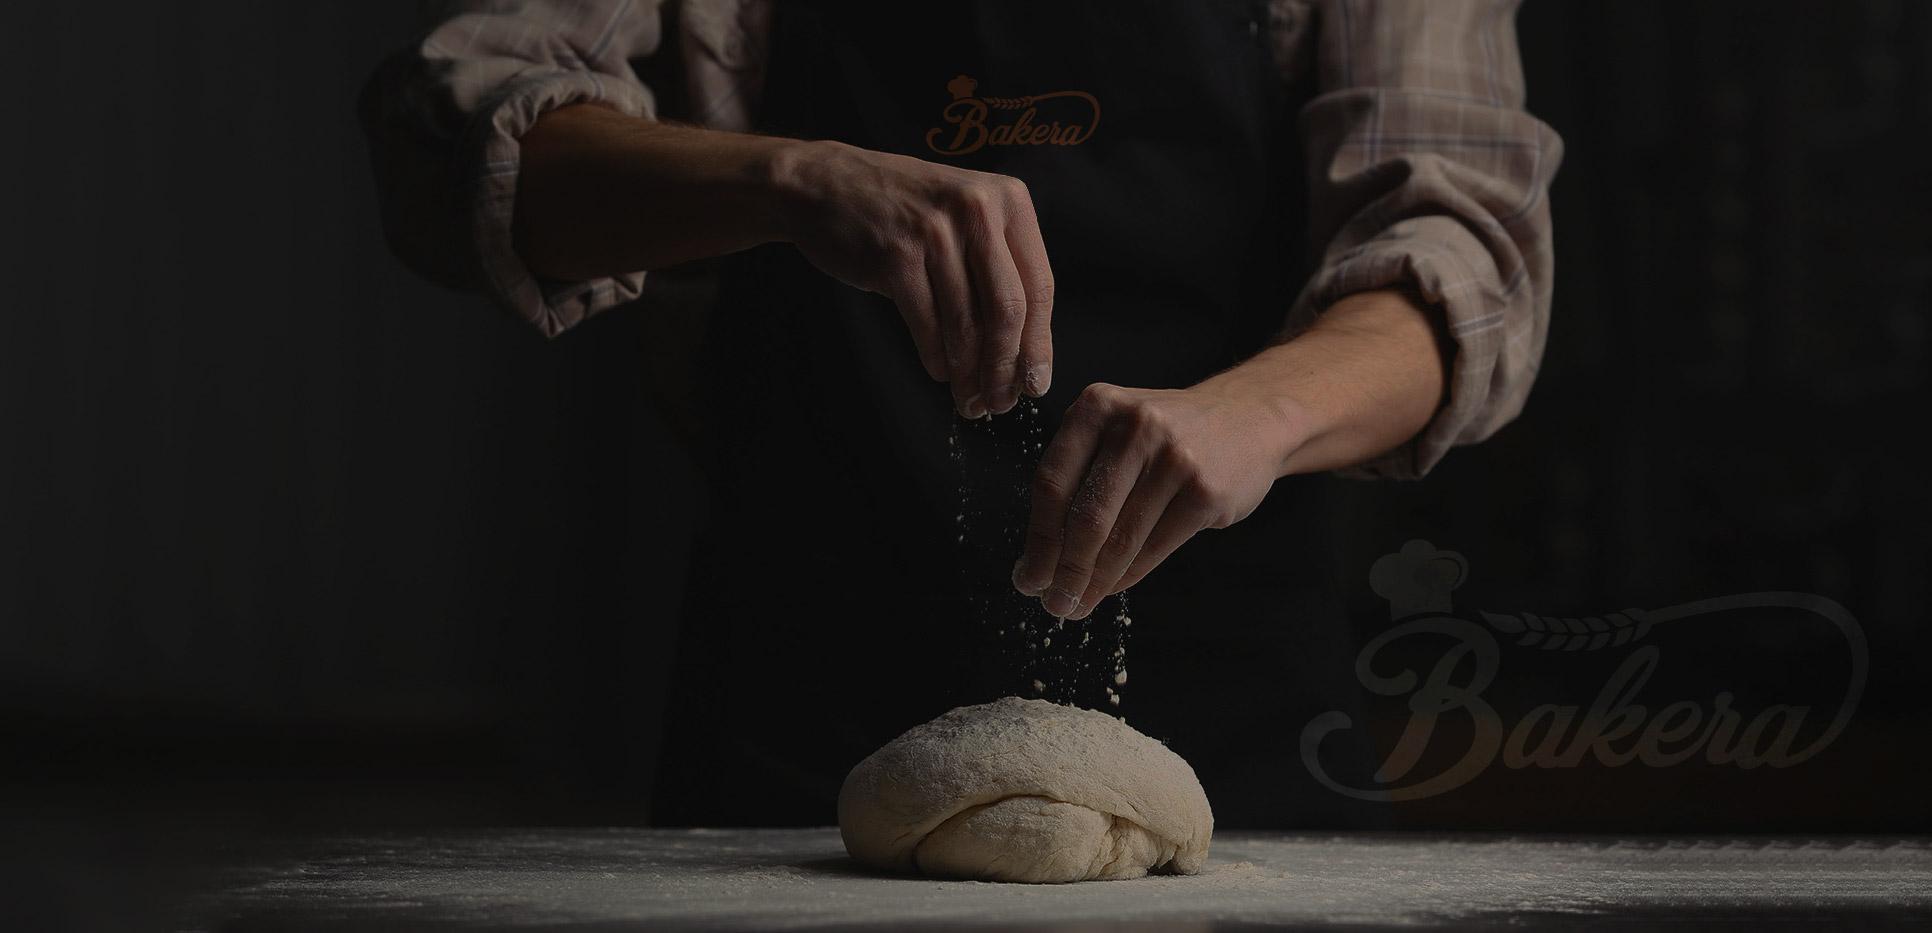 Sablon Bakera